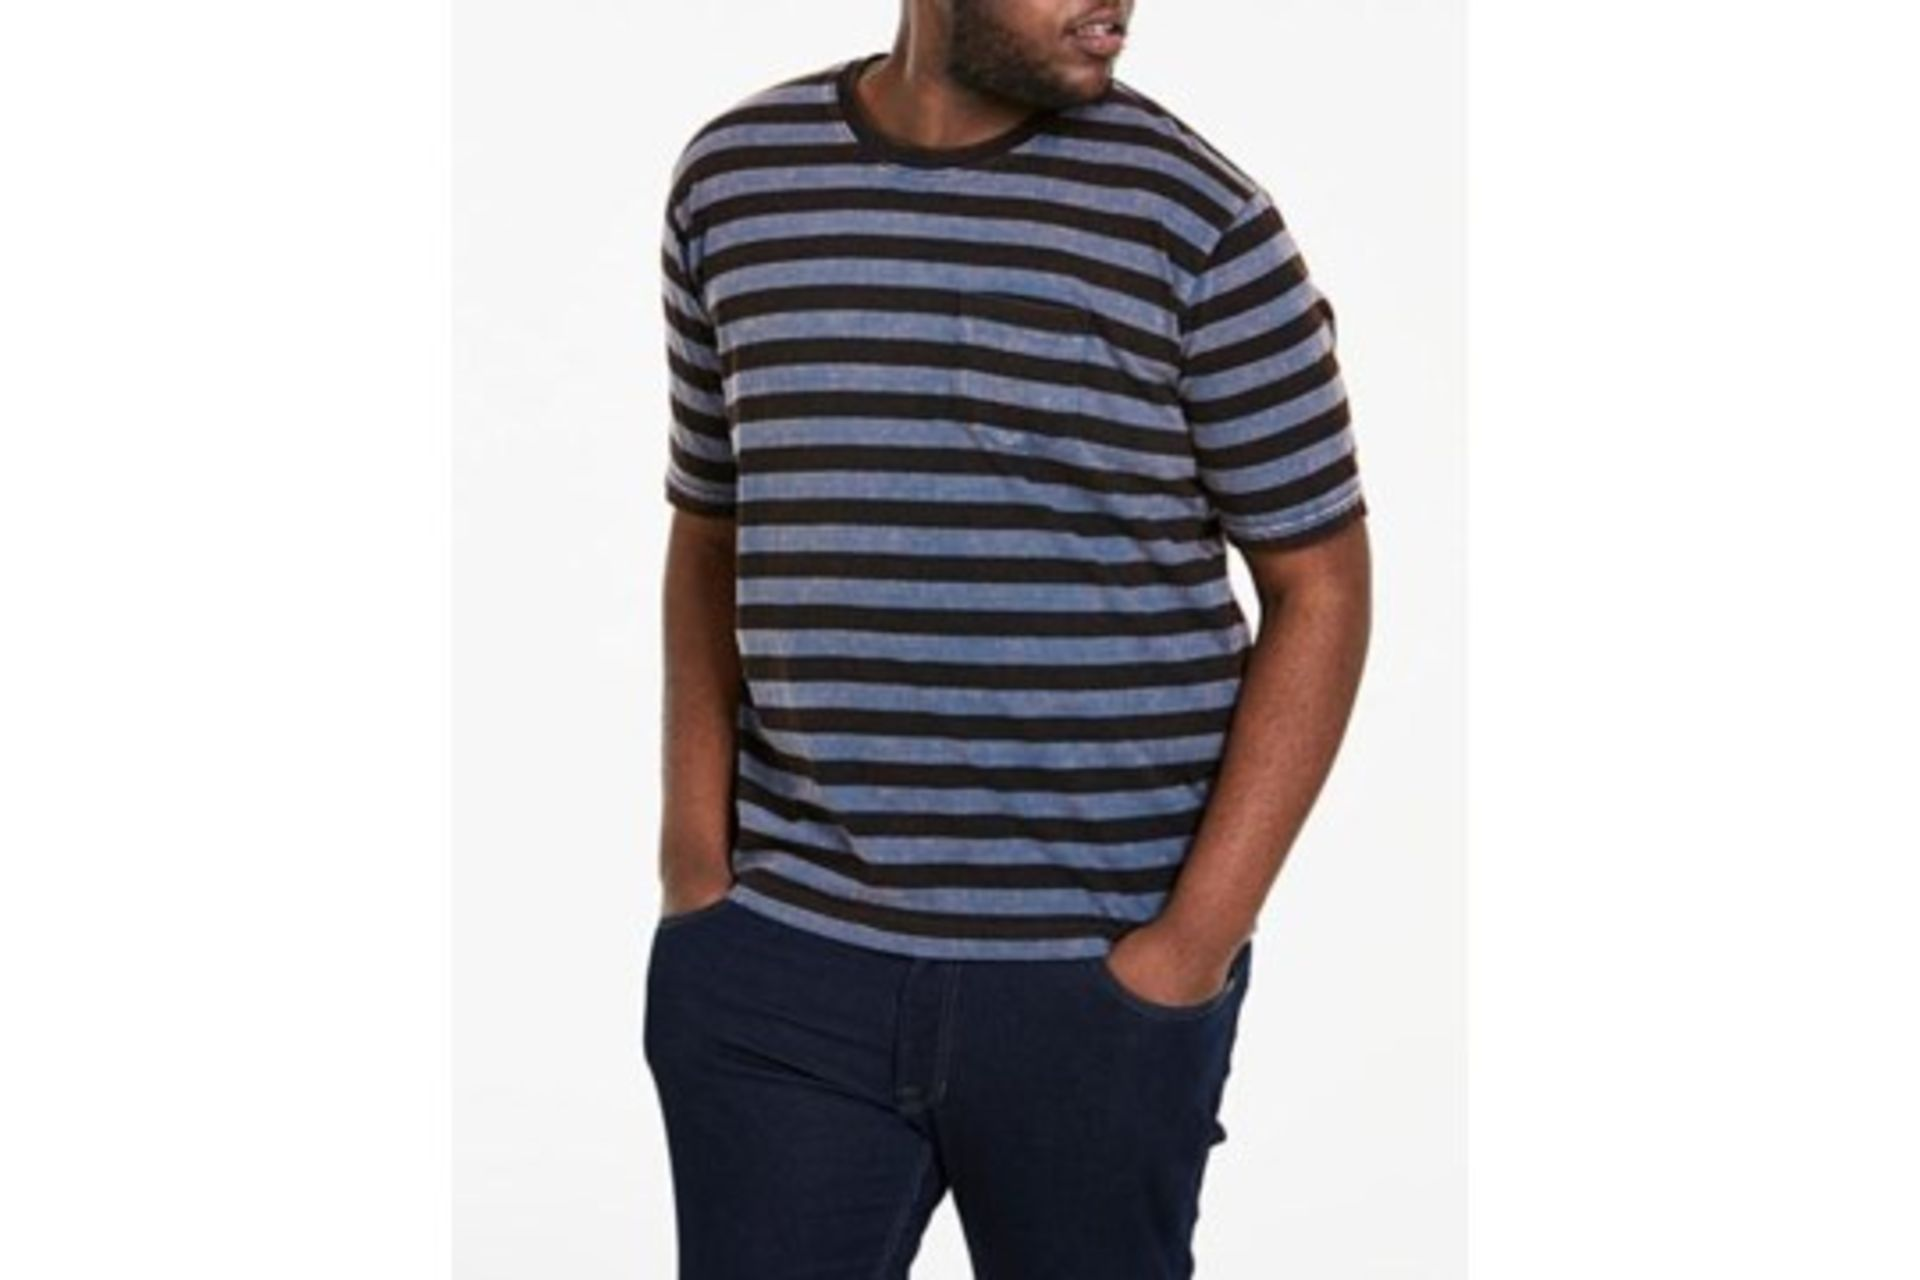 Lot 894 - Brand New Jackamo Blue and Black Stripe Designer T-Shirts RRP £10 Each